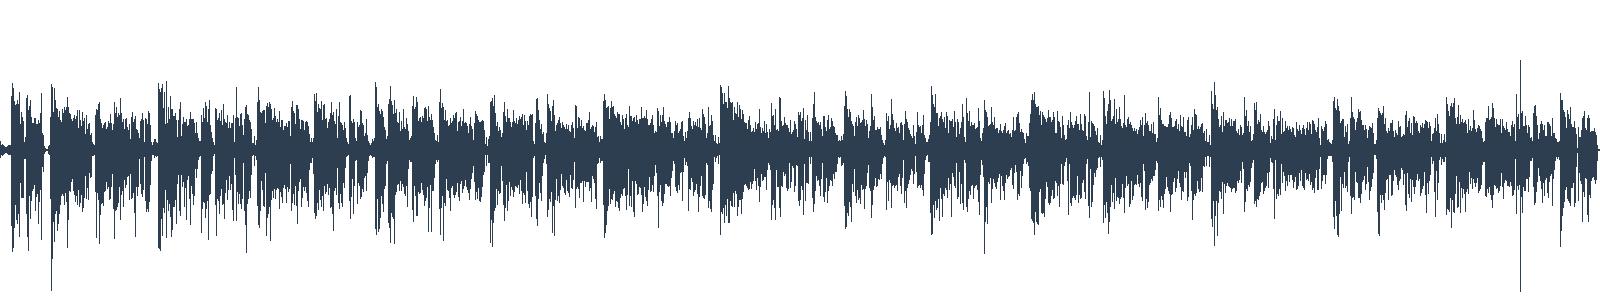 Nové audioknihy 33-34/2019 waveform